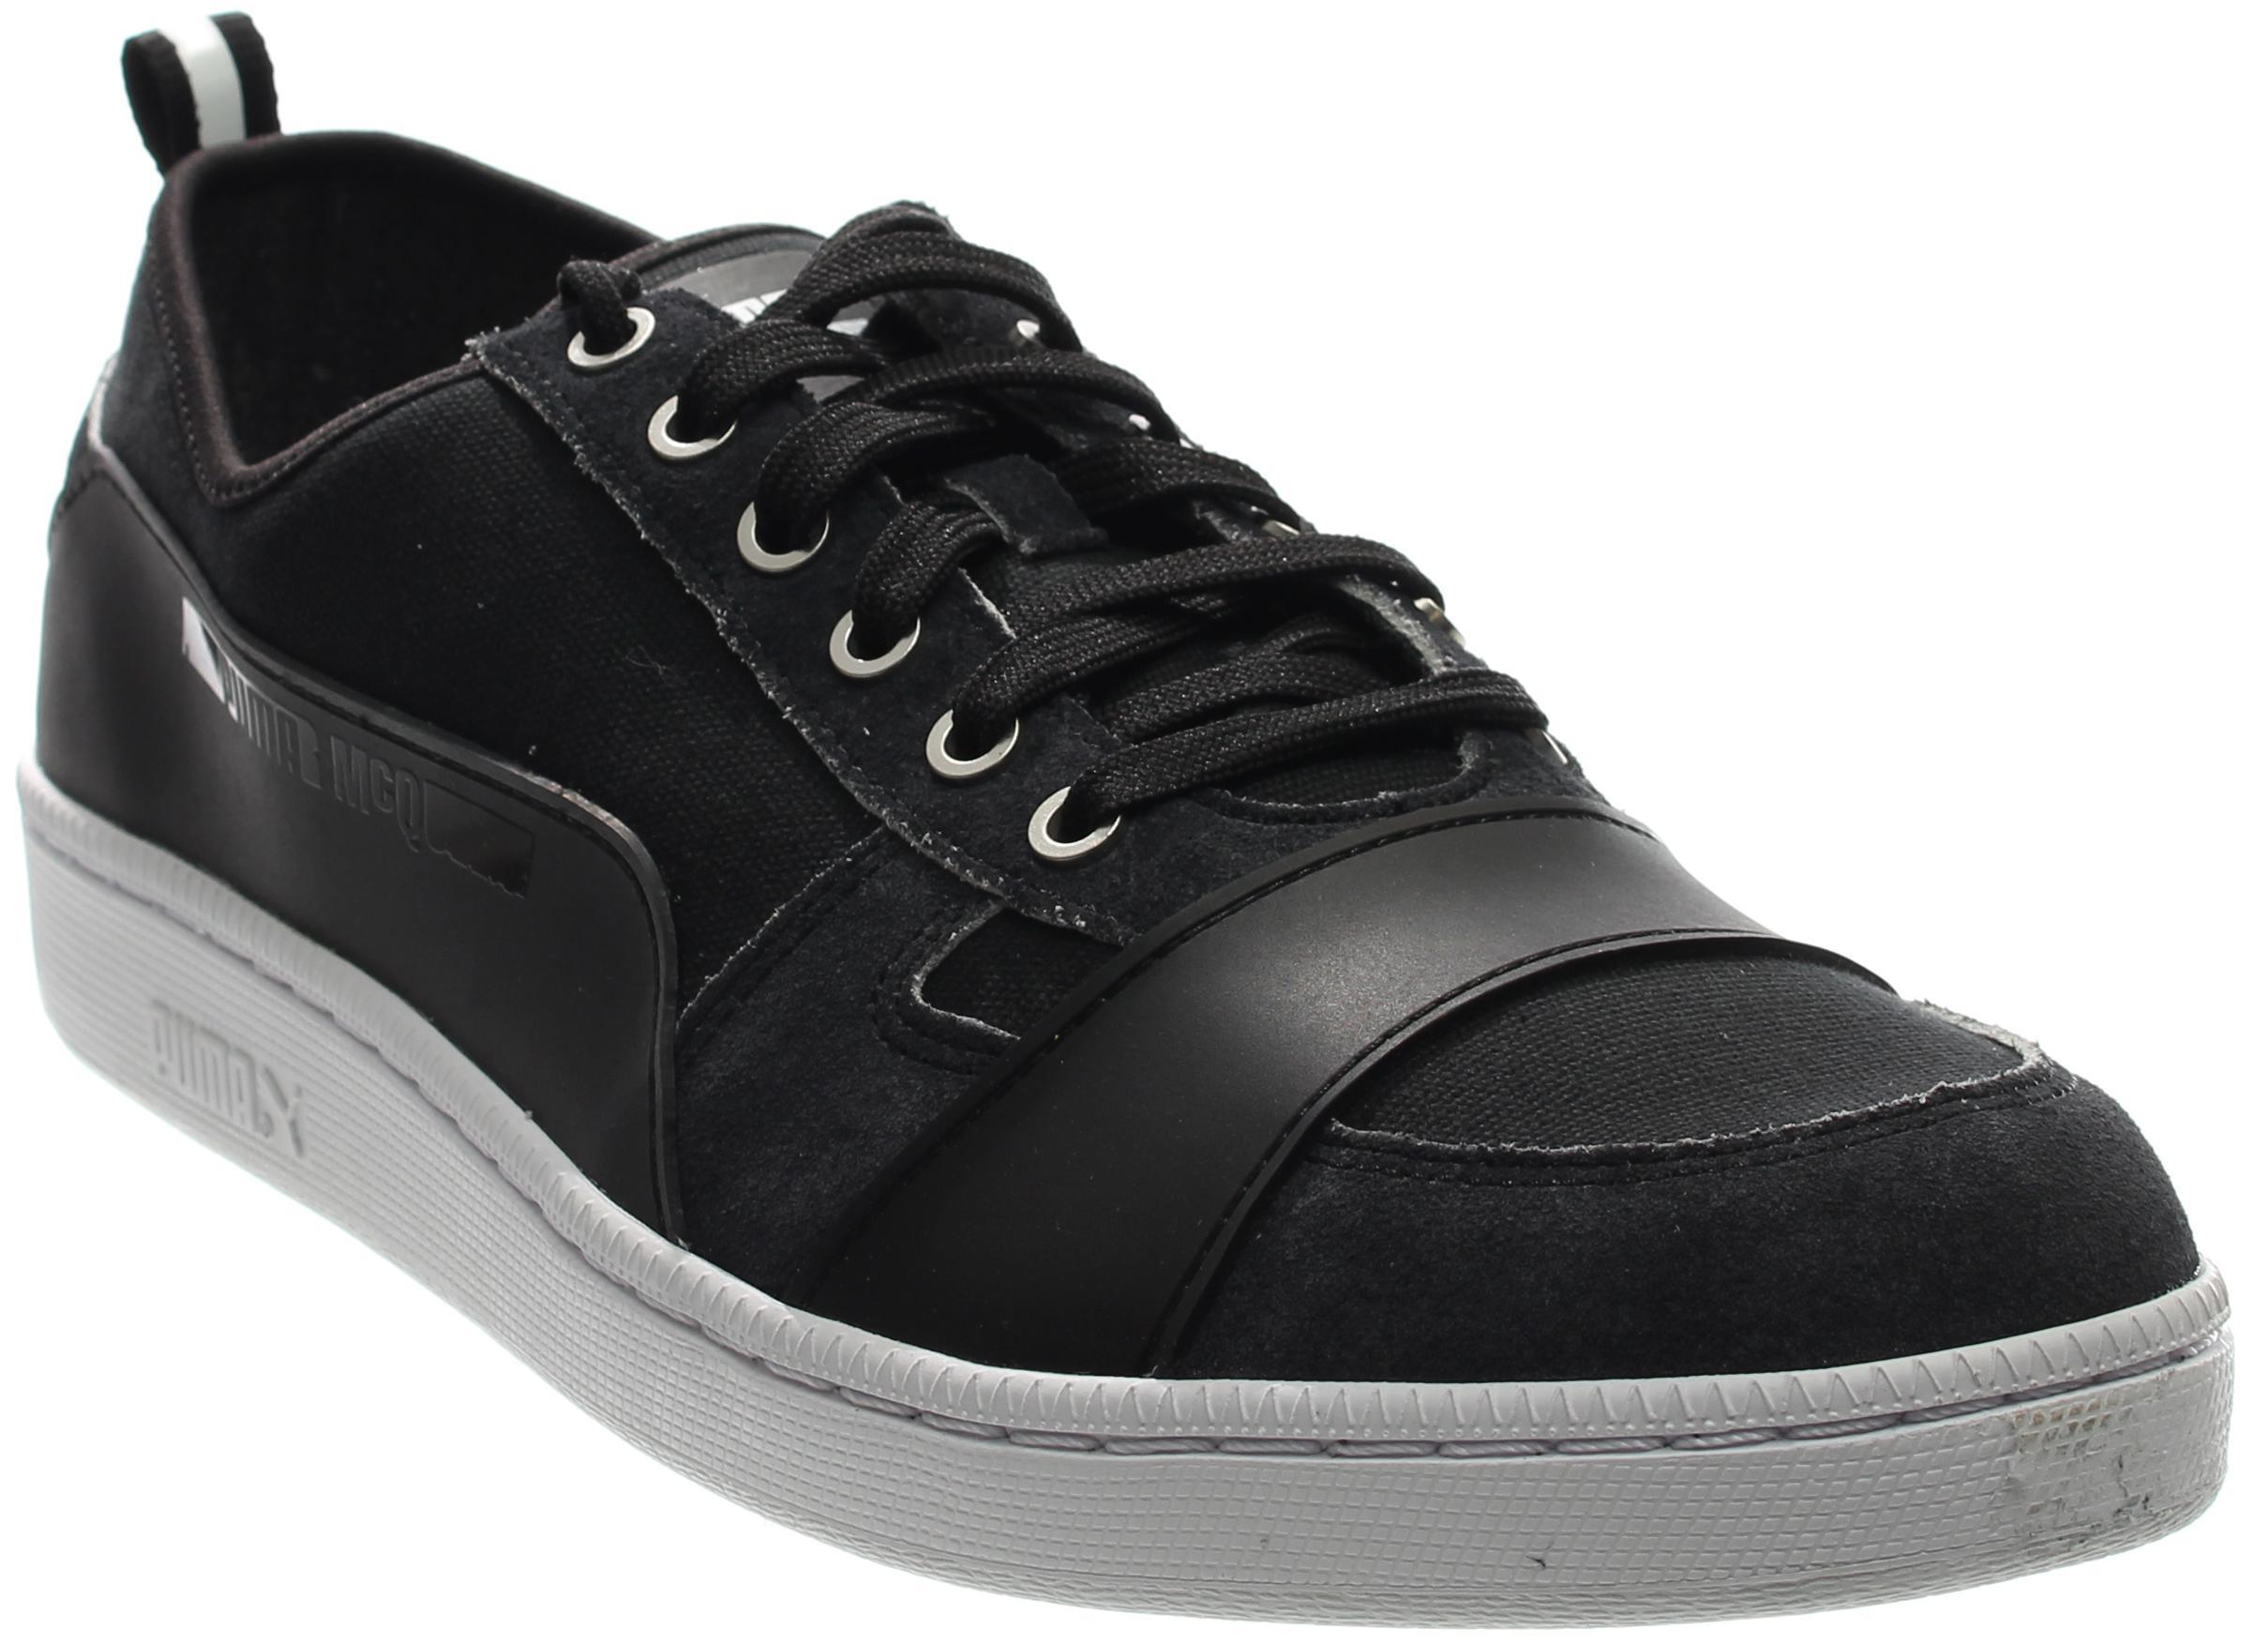 57b93271948c Lyst - PUMA X Alexander Mcqueen Serve Low in Black for Men - Save 55%